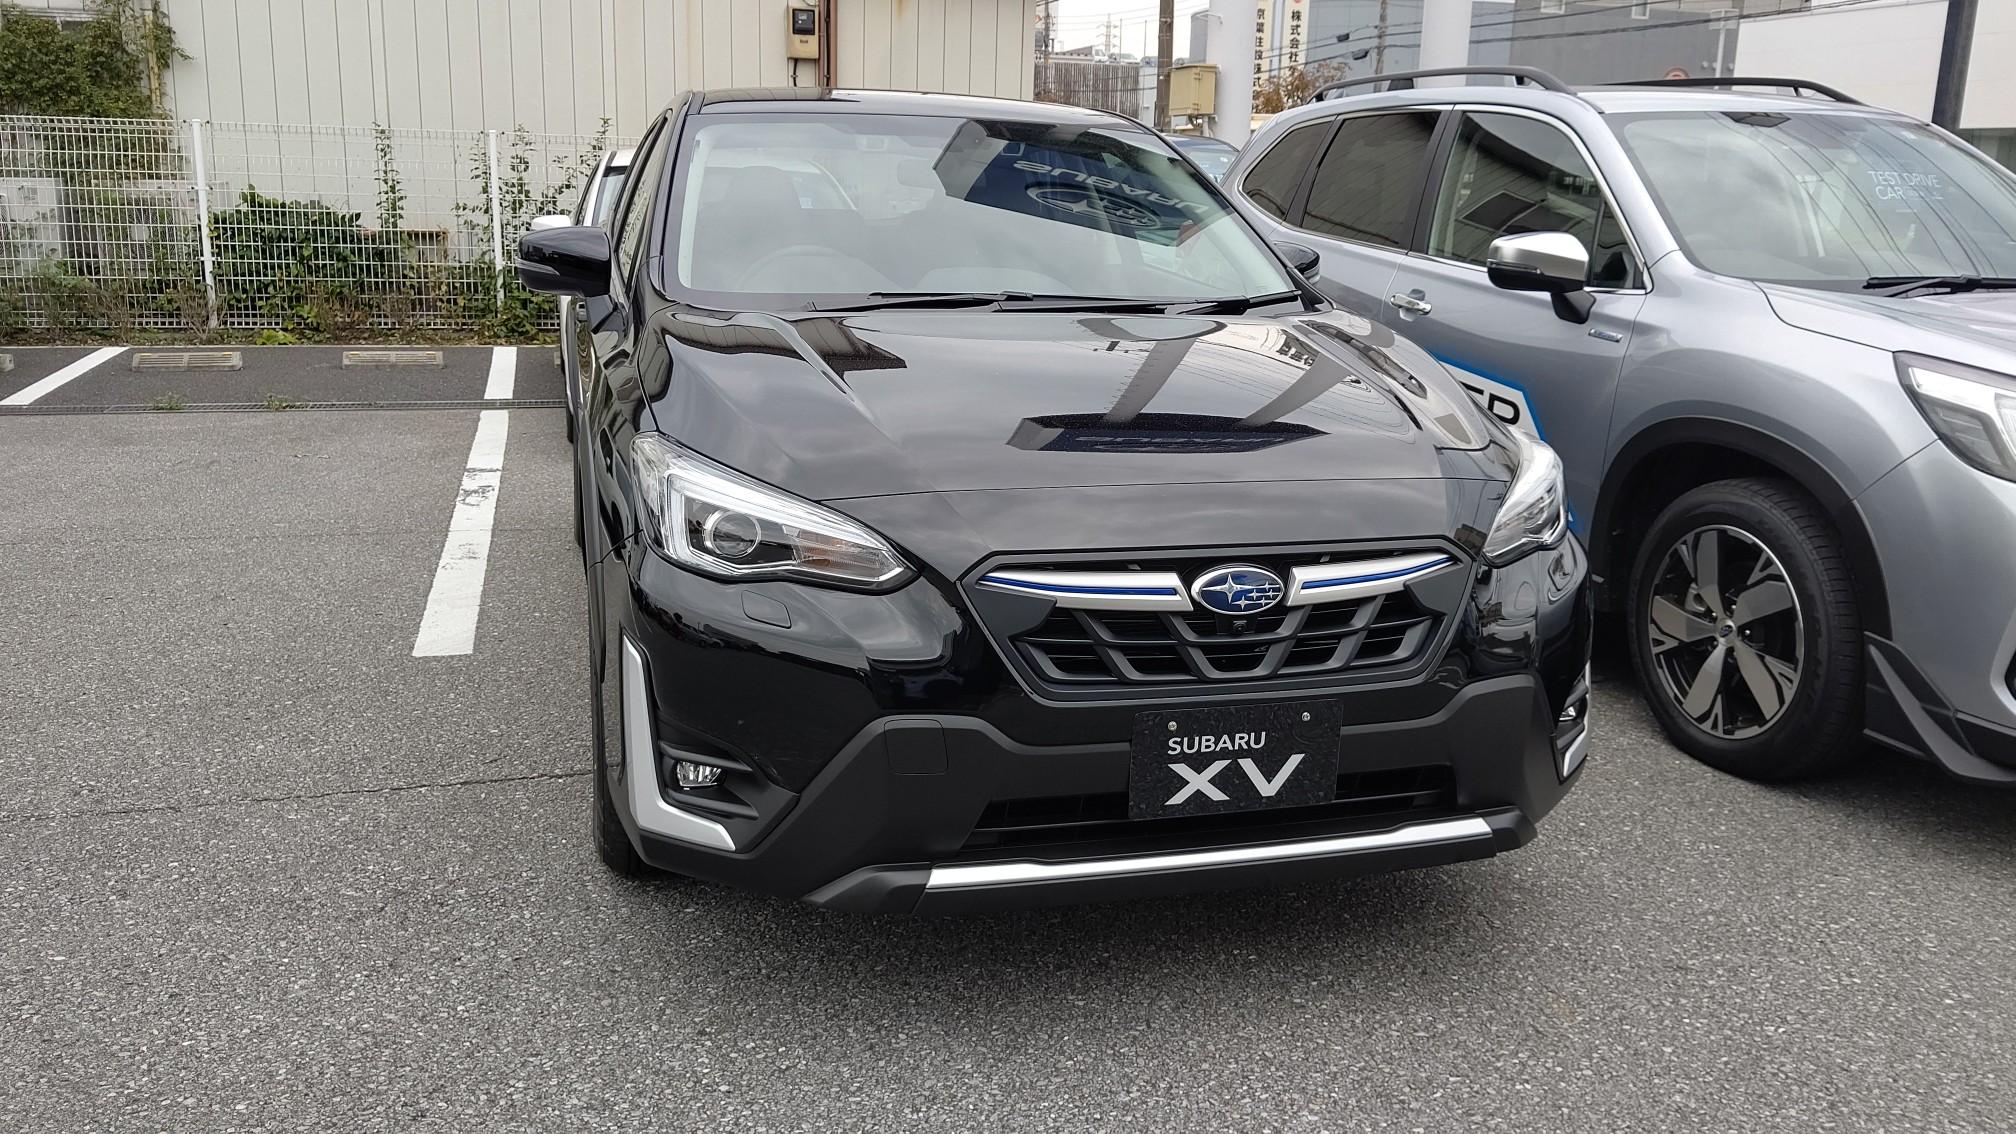 Xv 新型 スバル